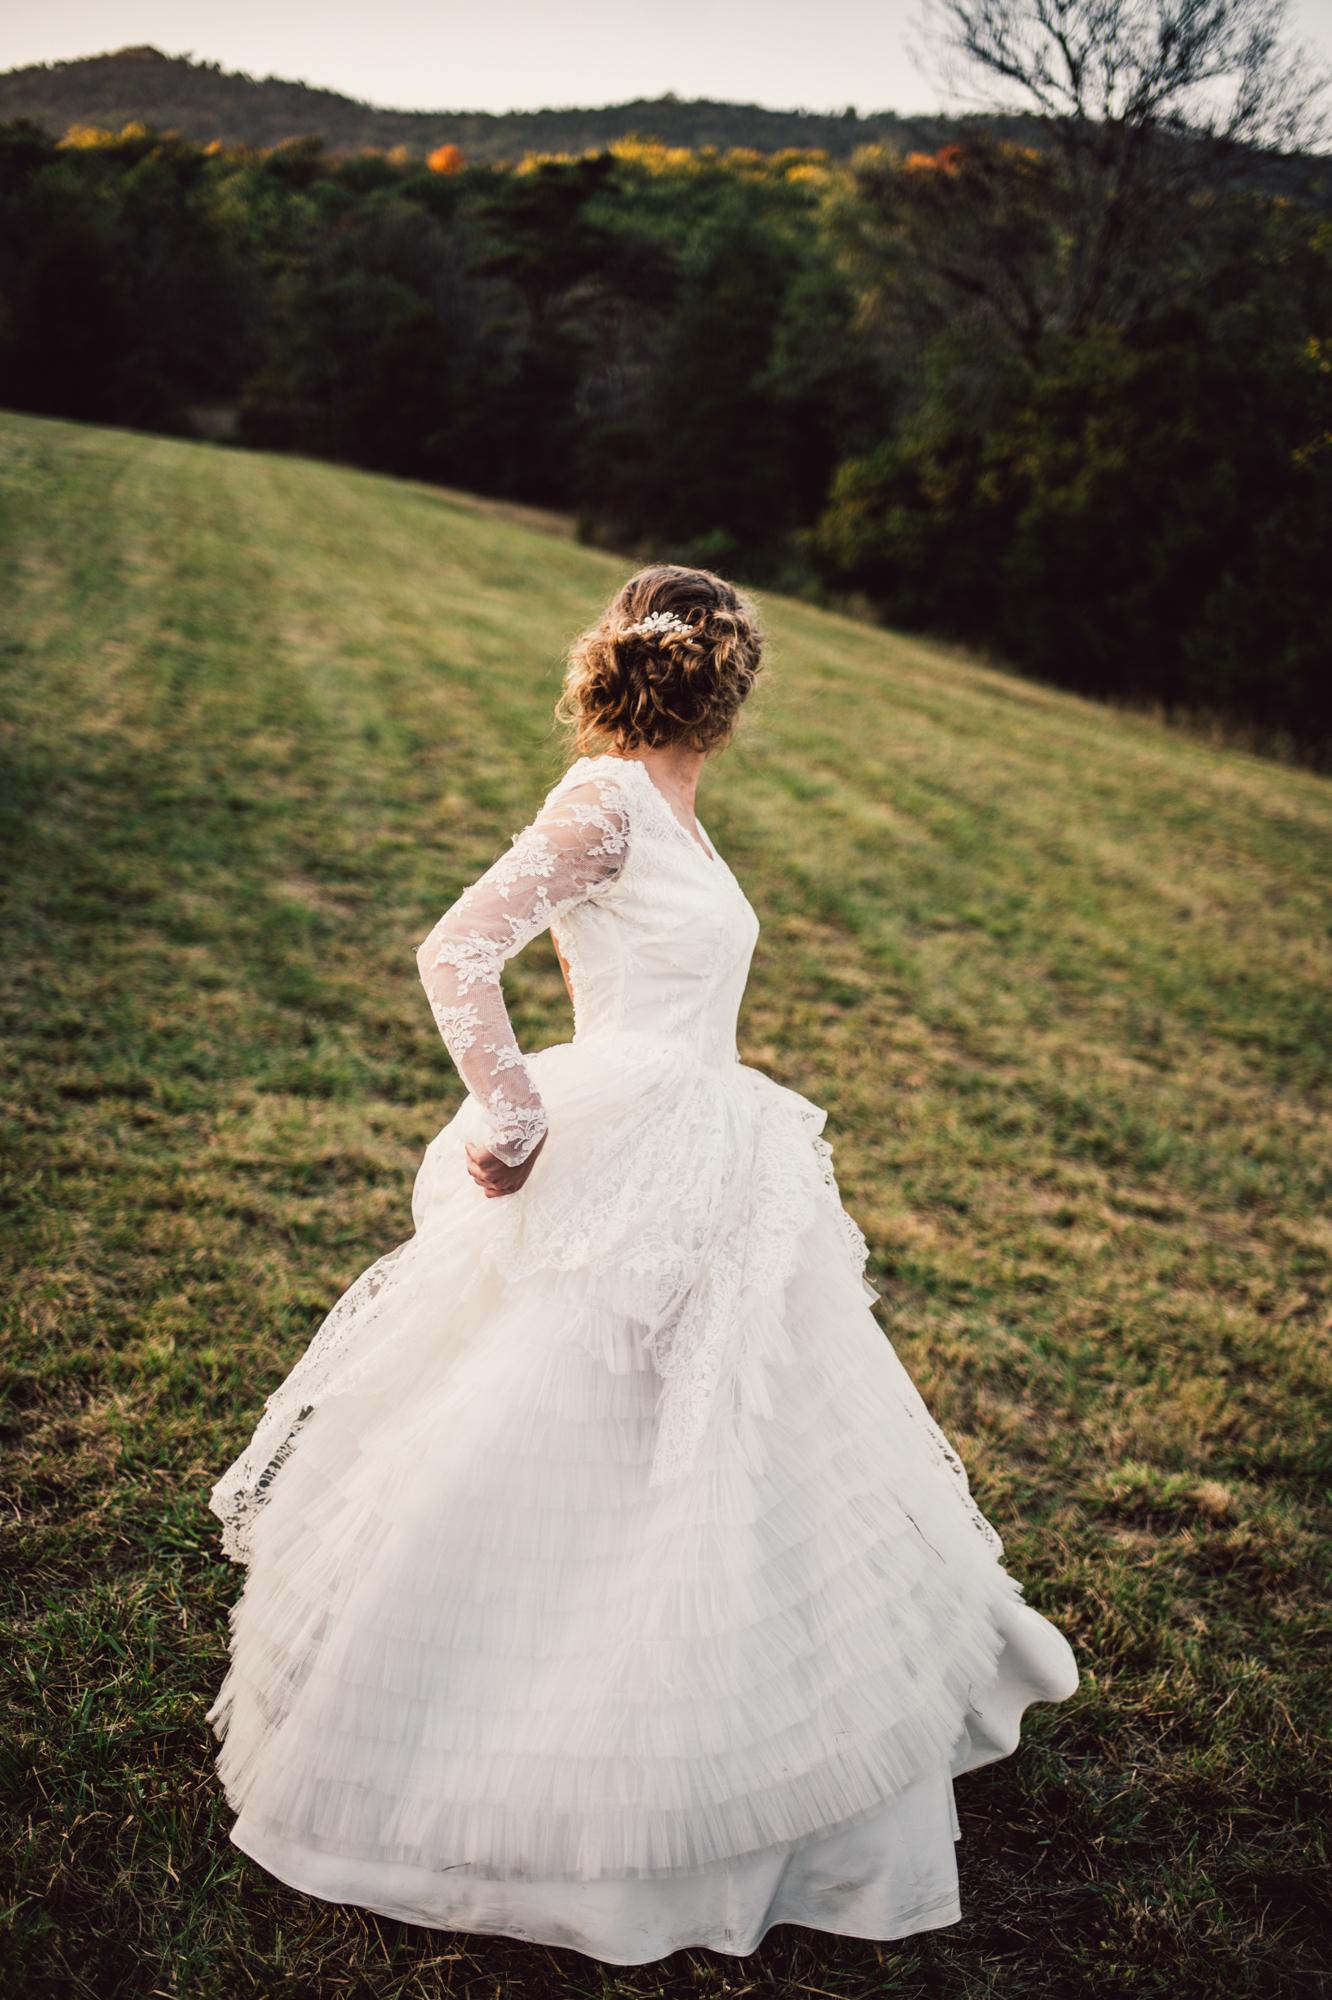 Ashley-and-Michael-Beaune-Woodstock-Virginia-Wedding-Shenandoah-Valley_47.JPG